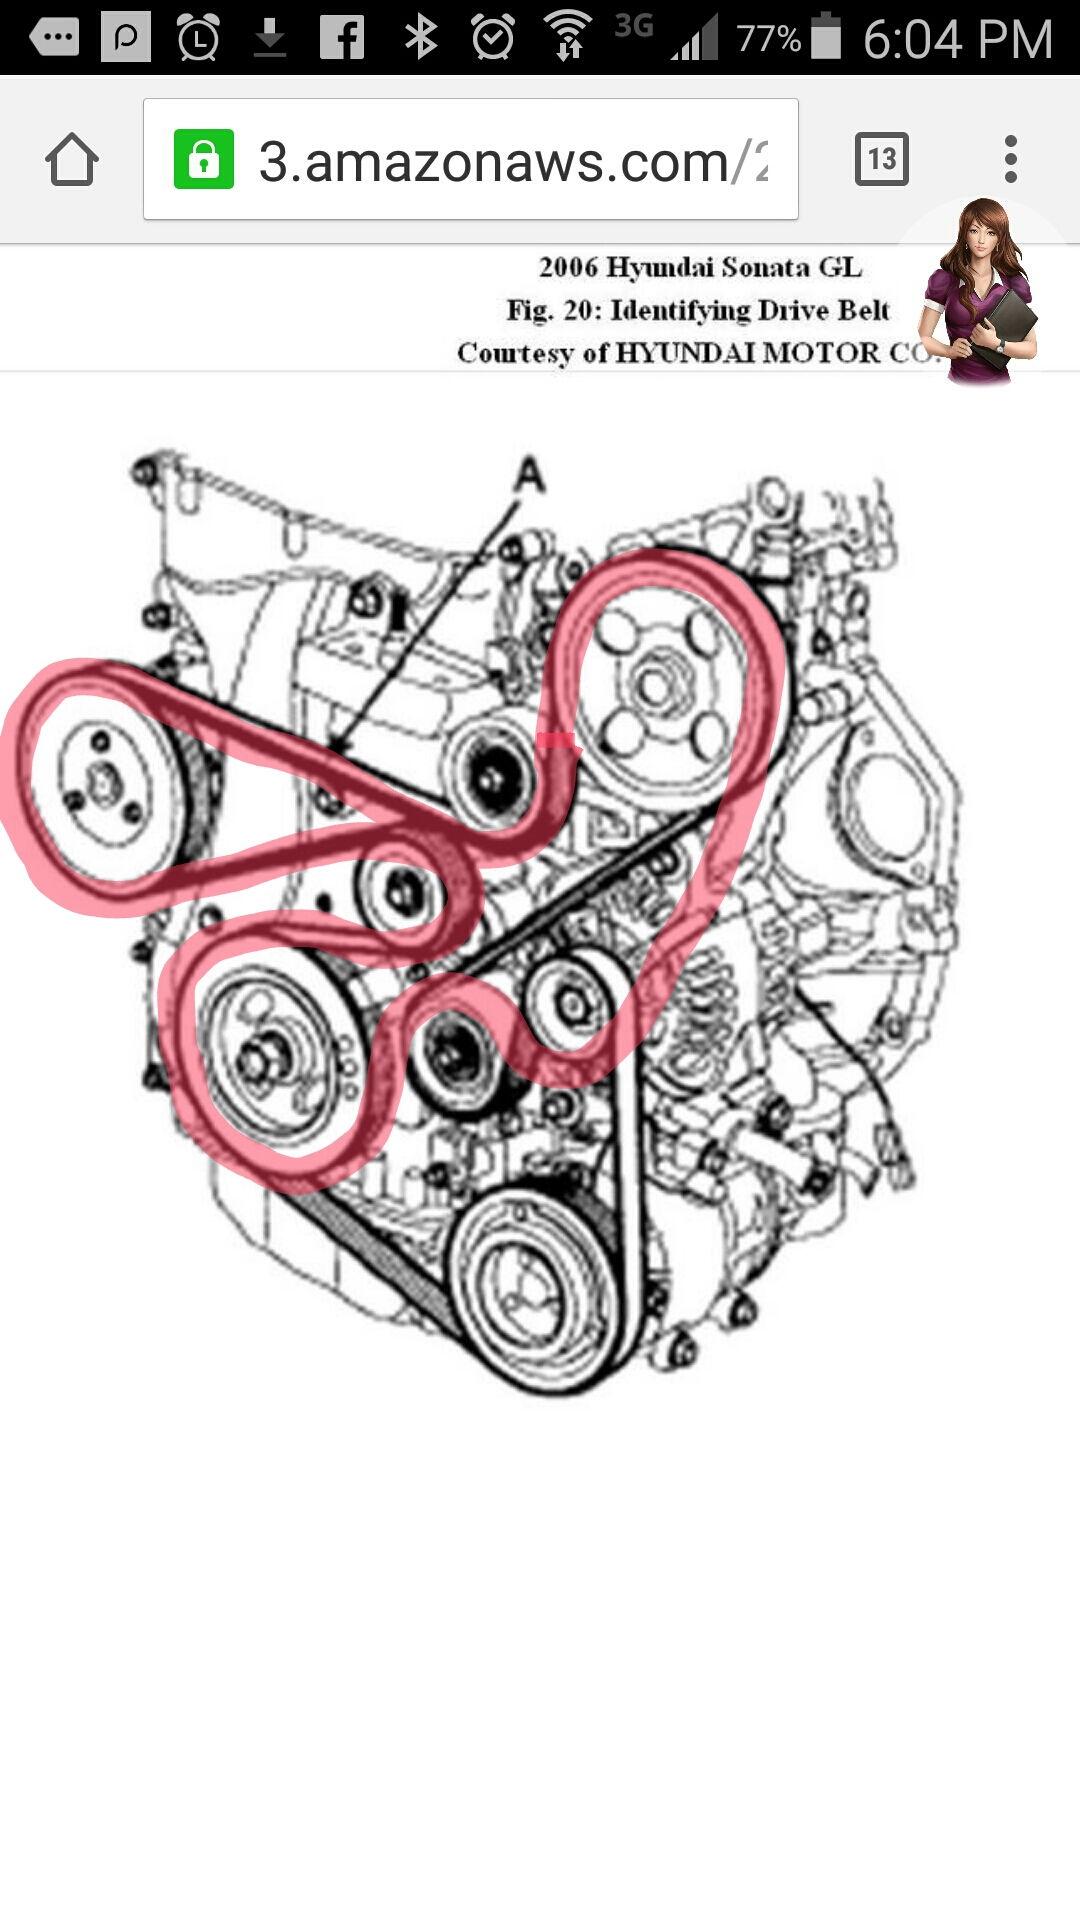 hight resolution of mercruiser ignition switch wiring diagram 5 7 mercruiser 4 1999 volvo penta 4 3gl pdf volvo